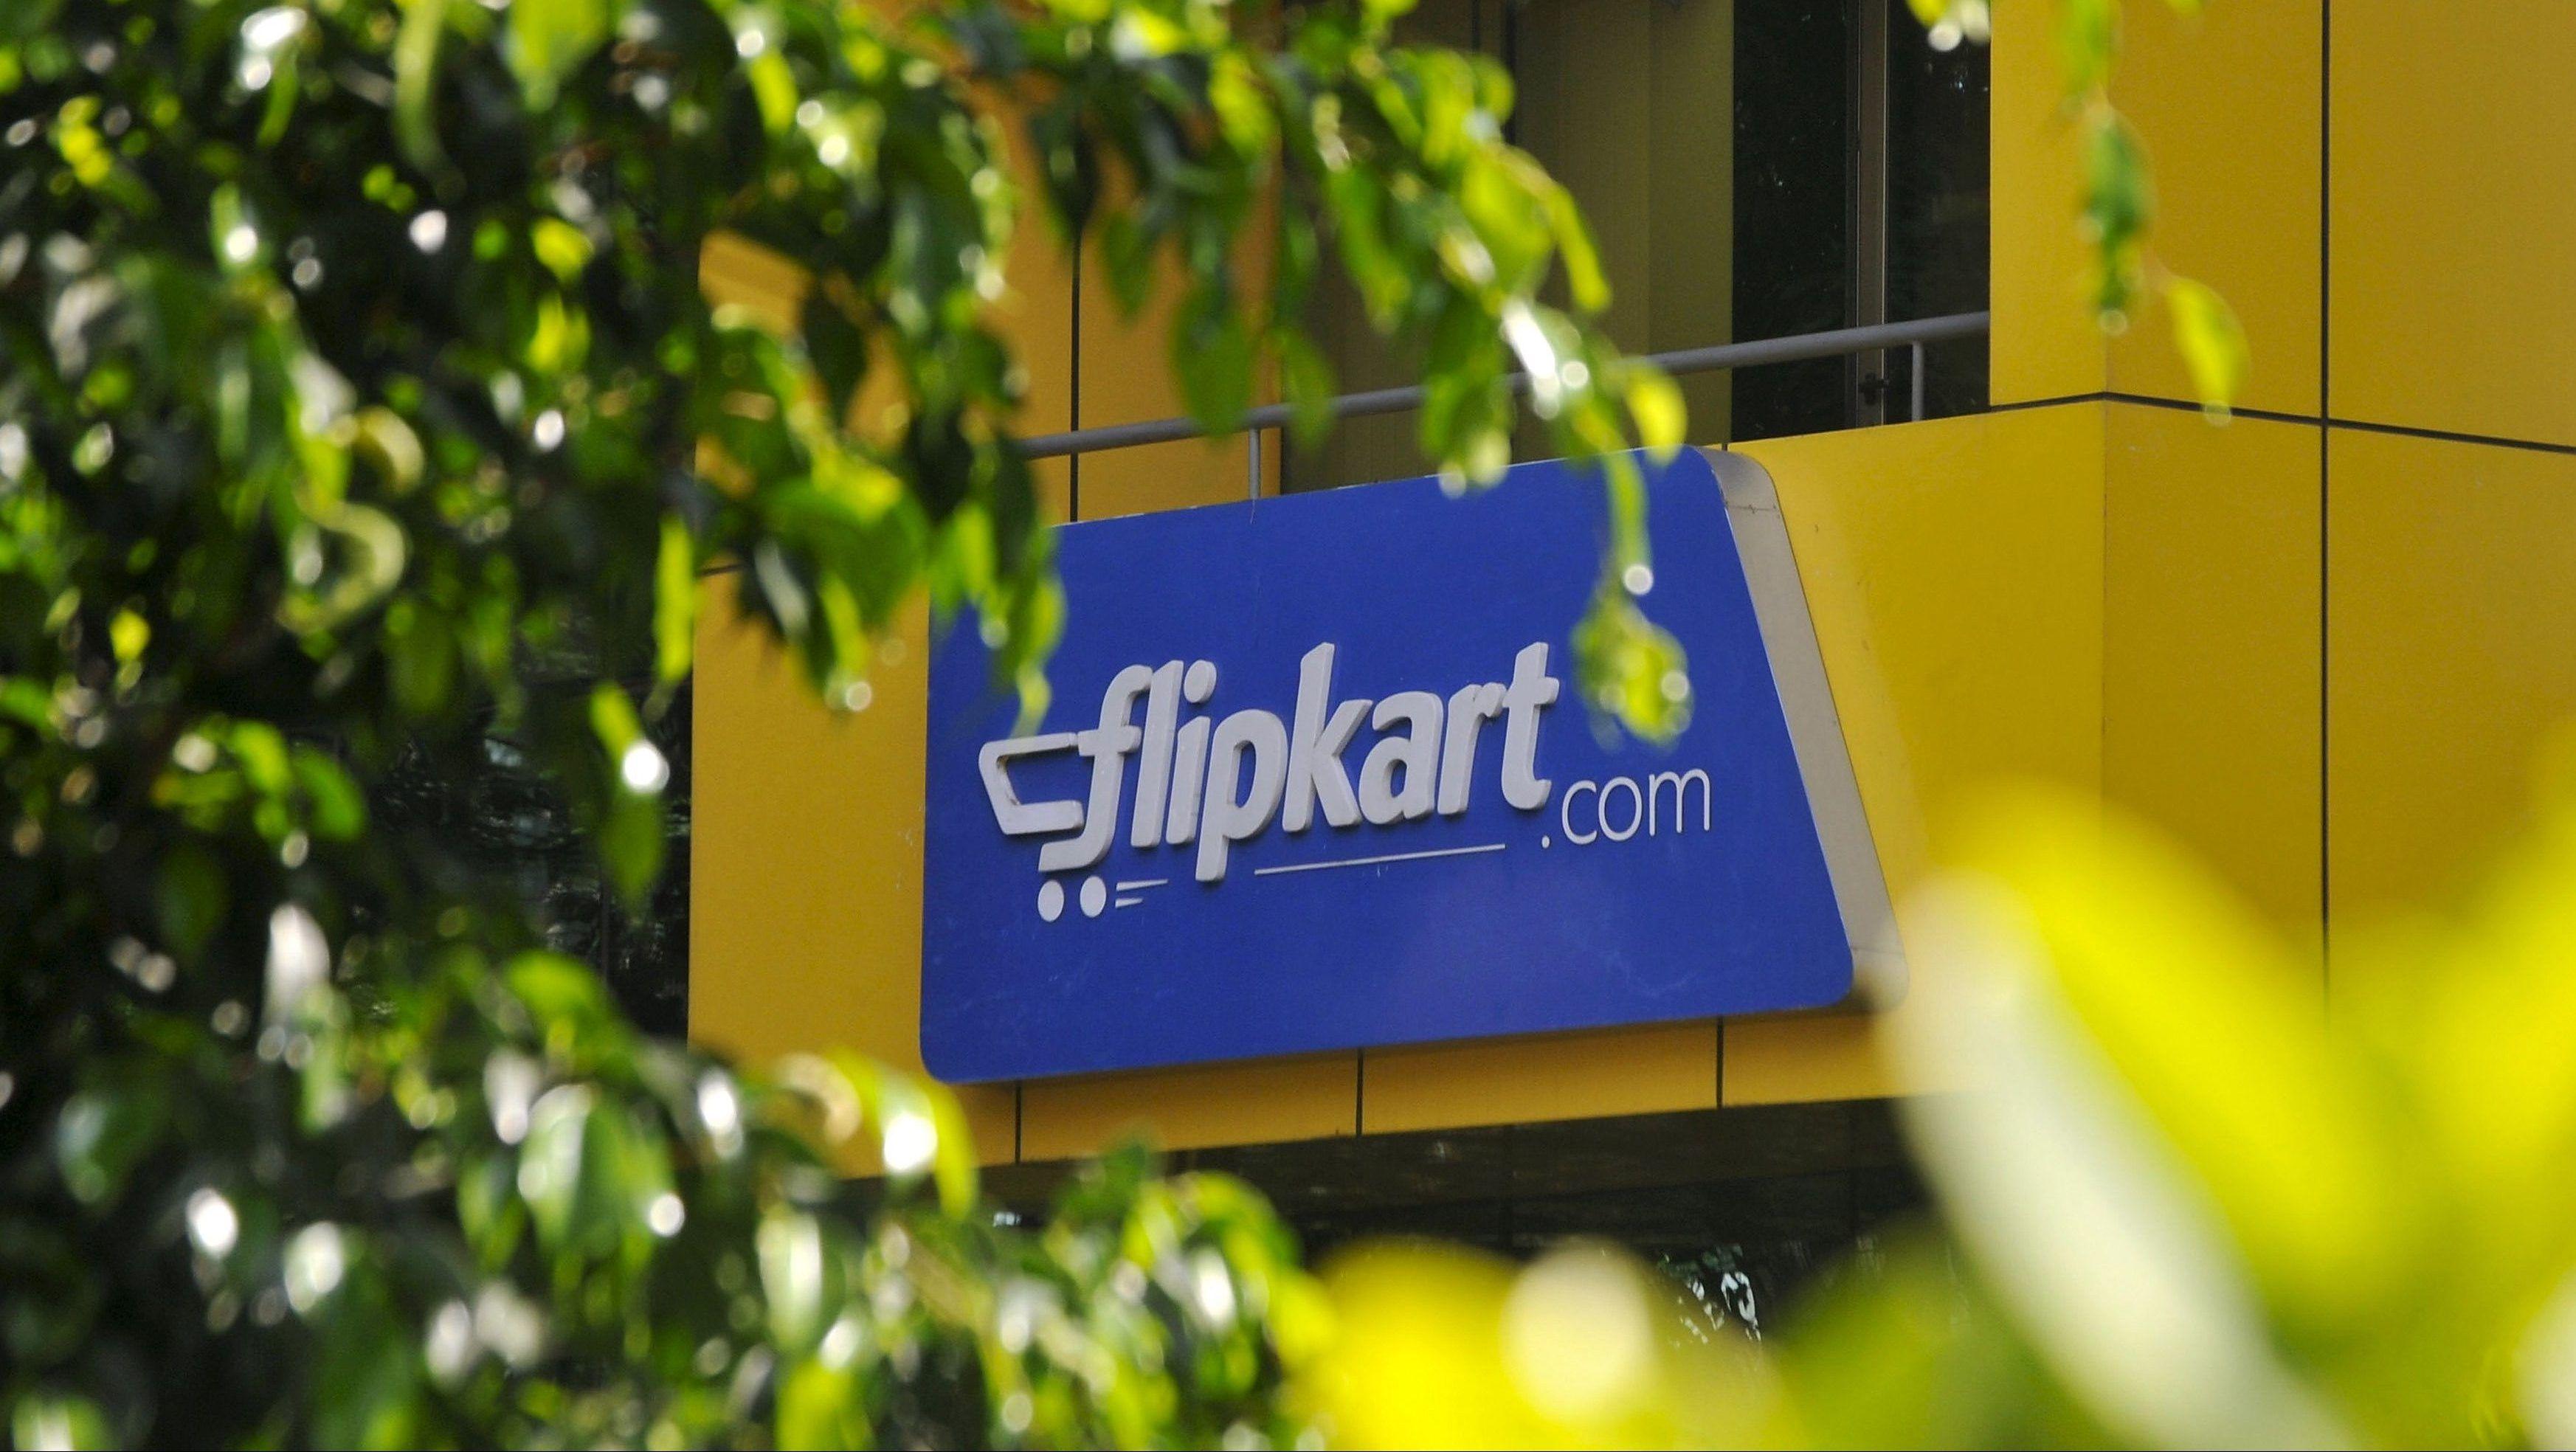 Walmart buys controlling stake in